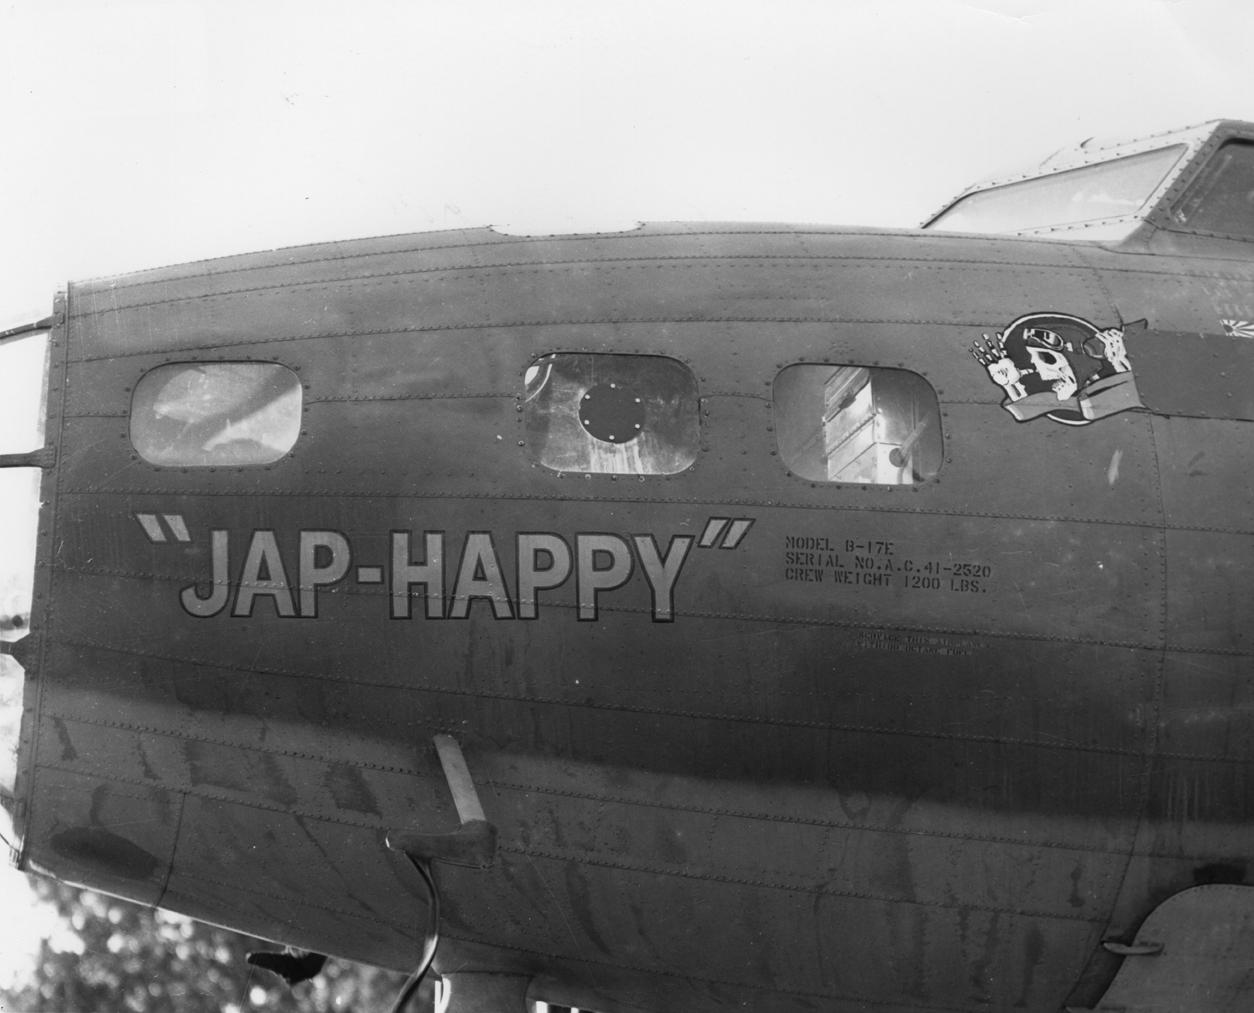 B-17 #41-2520 / Jap-Happy